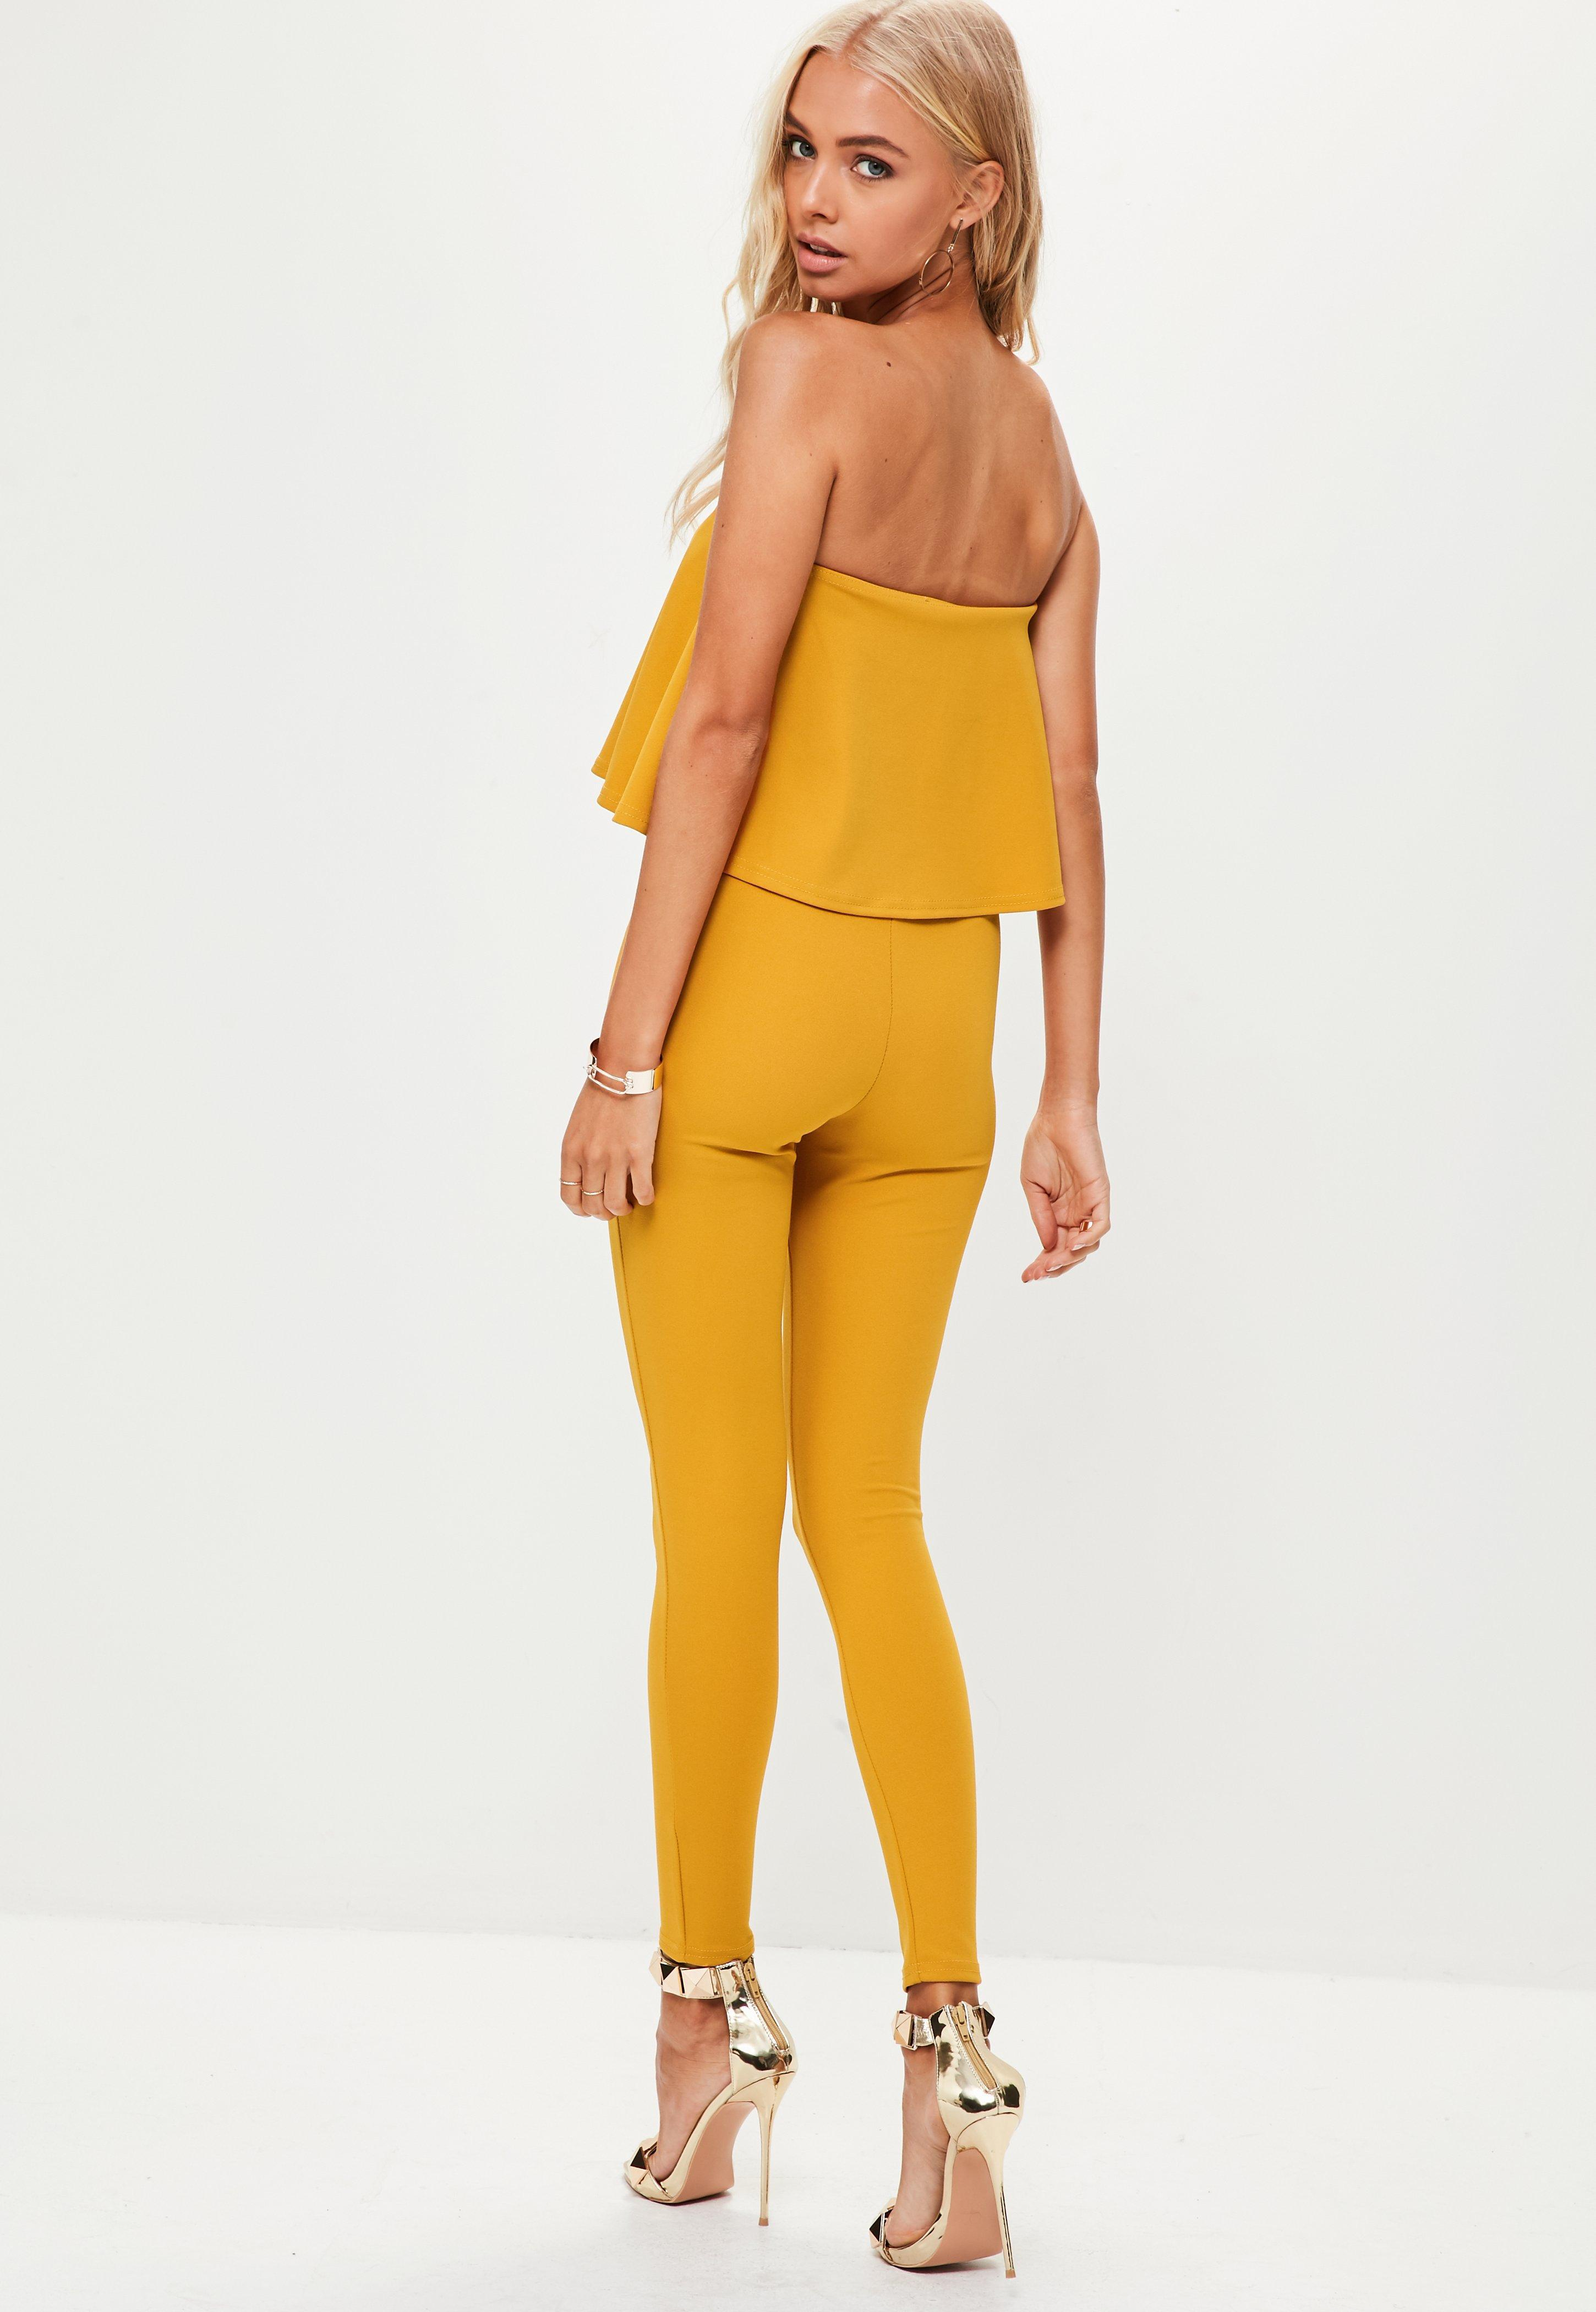 Missguided Yellow Bandeau Unitard Jumpsuit - Lyst